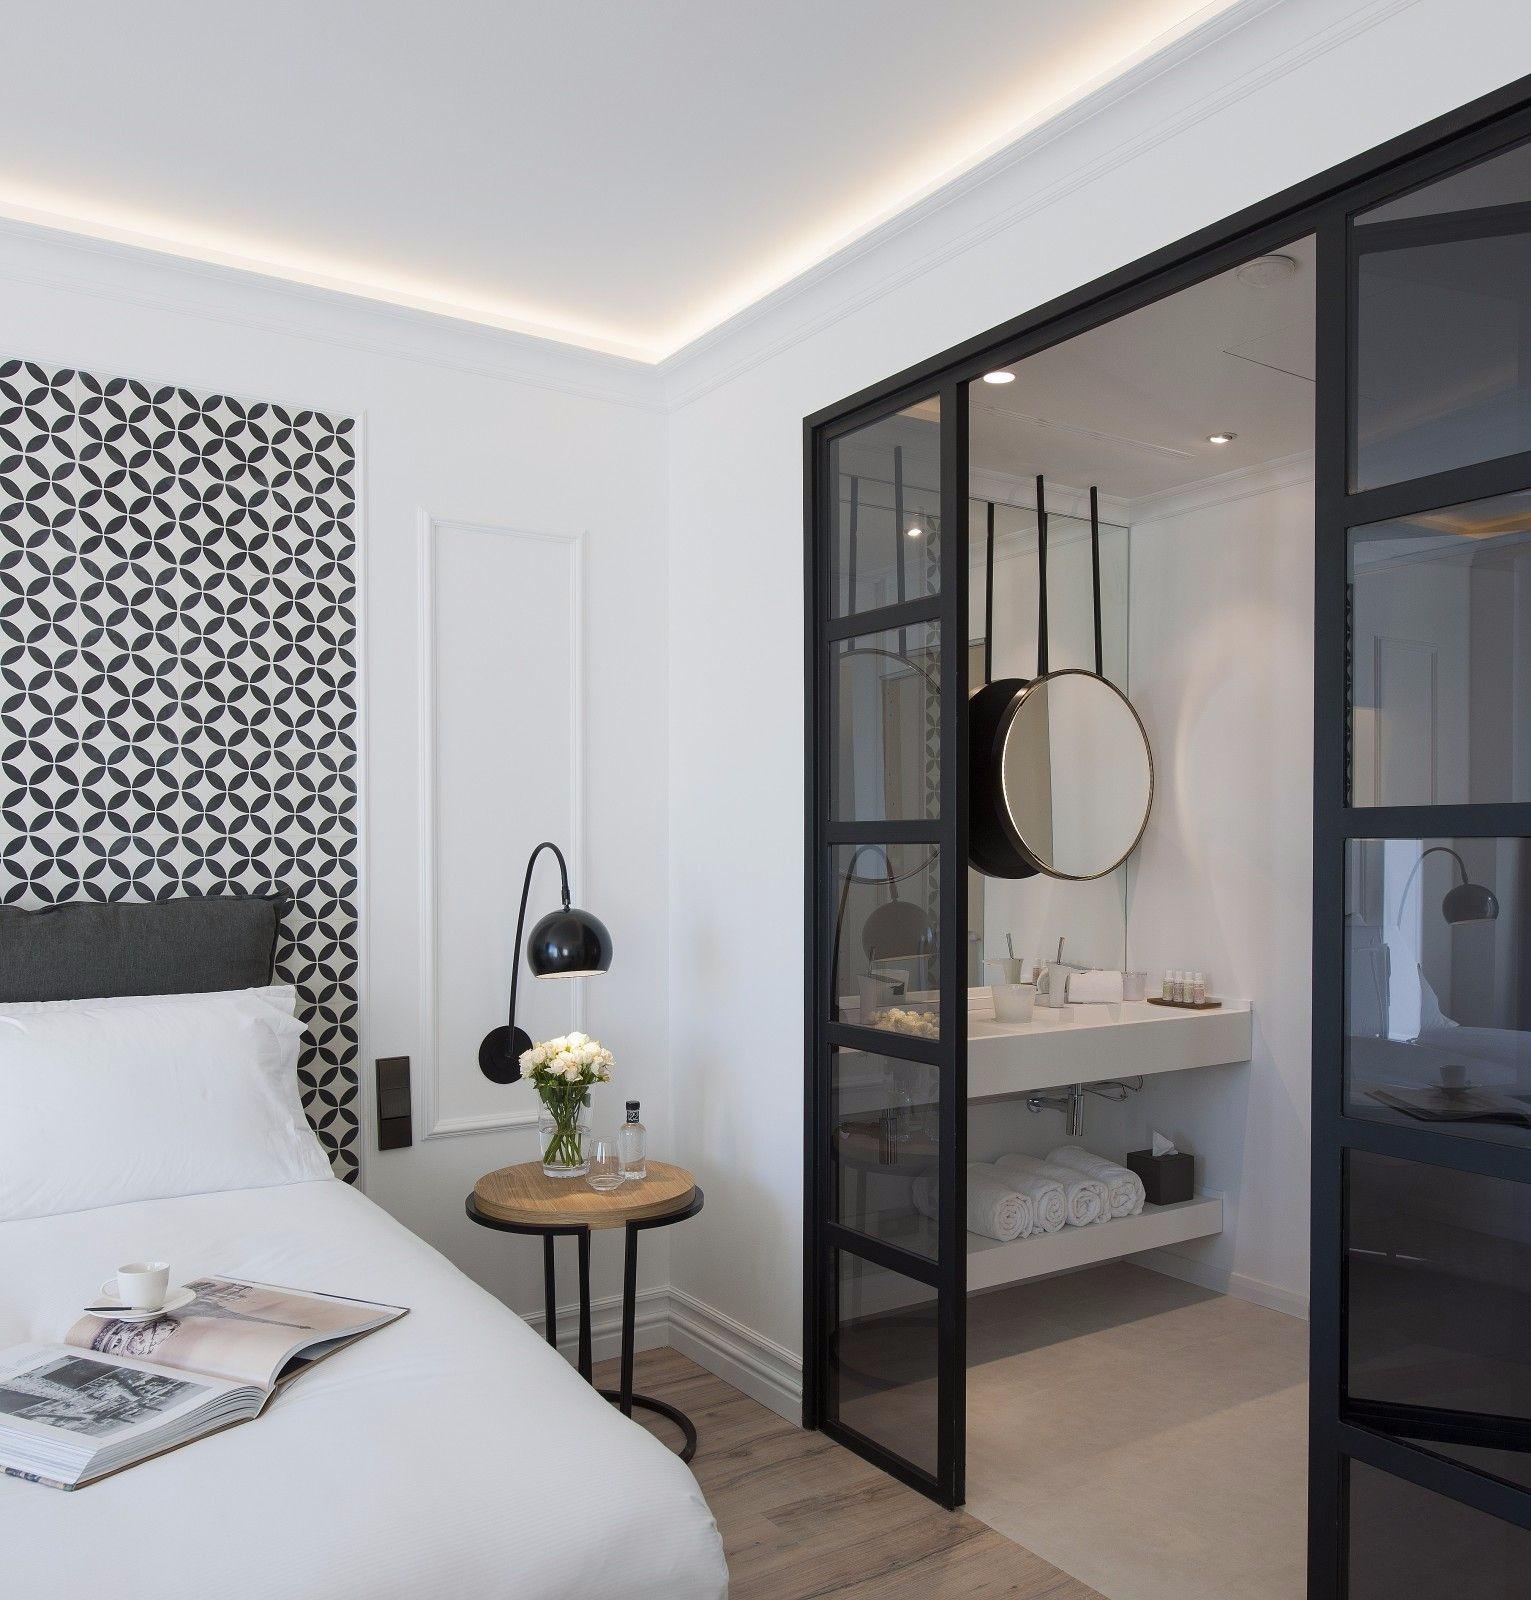 高端hotel设计 免费